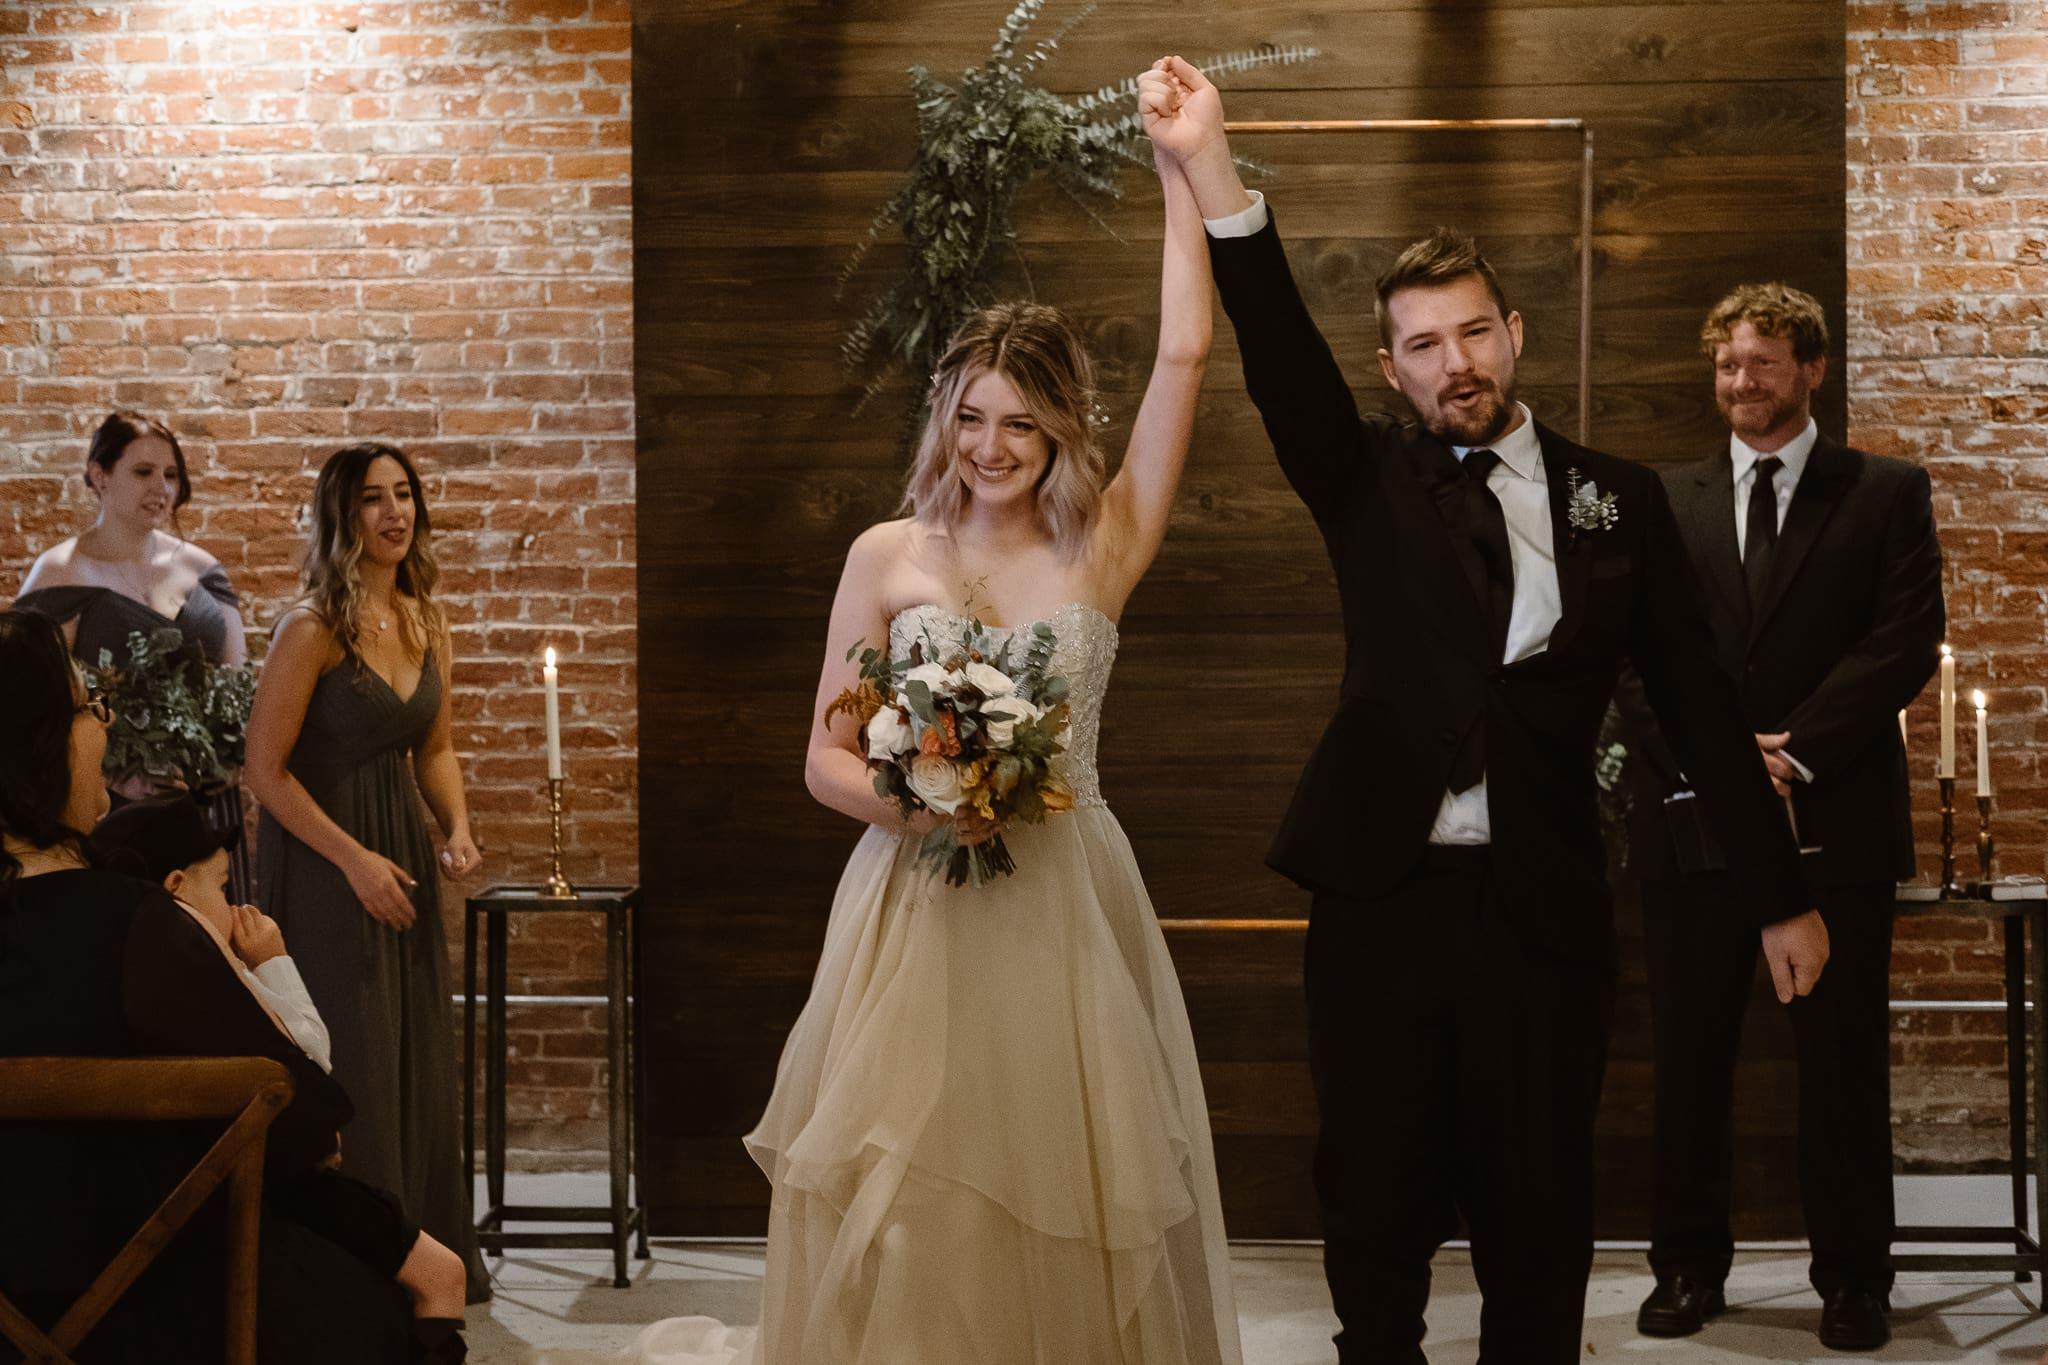 St Vrain Wedding Photographer   Longmont Wedding Photographer   Colorado Winter Wedding Photographer, Colorado industrial chic wedding ceremony, ceremony recessional